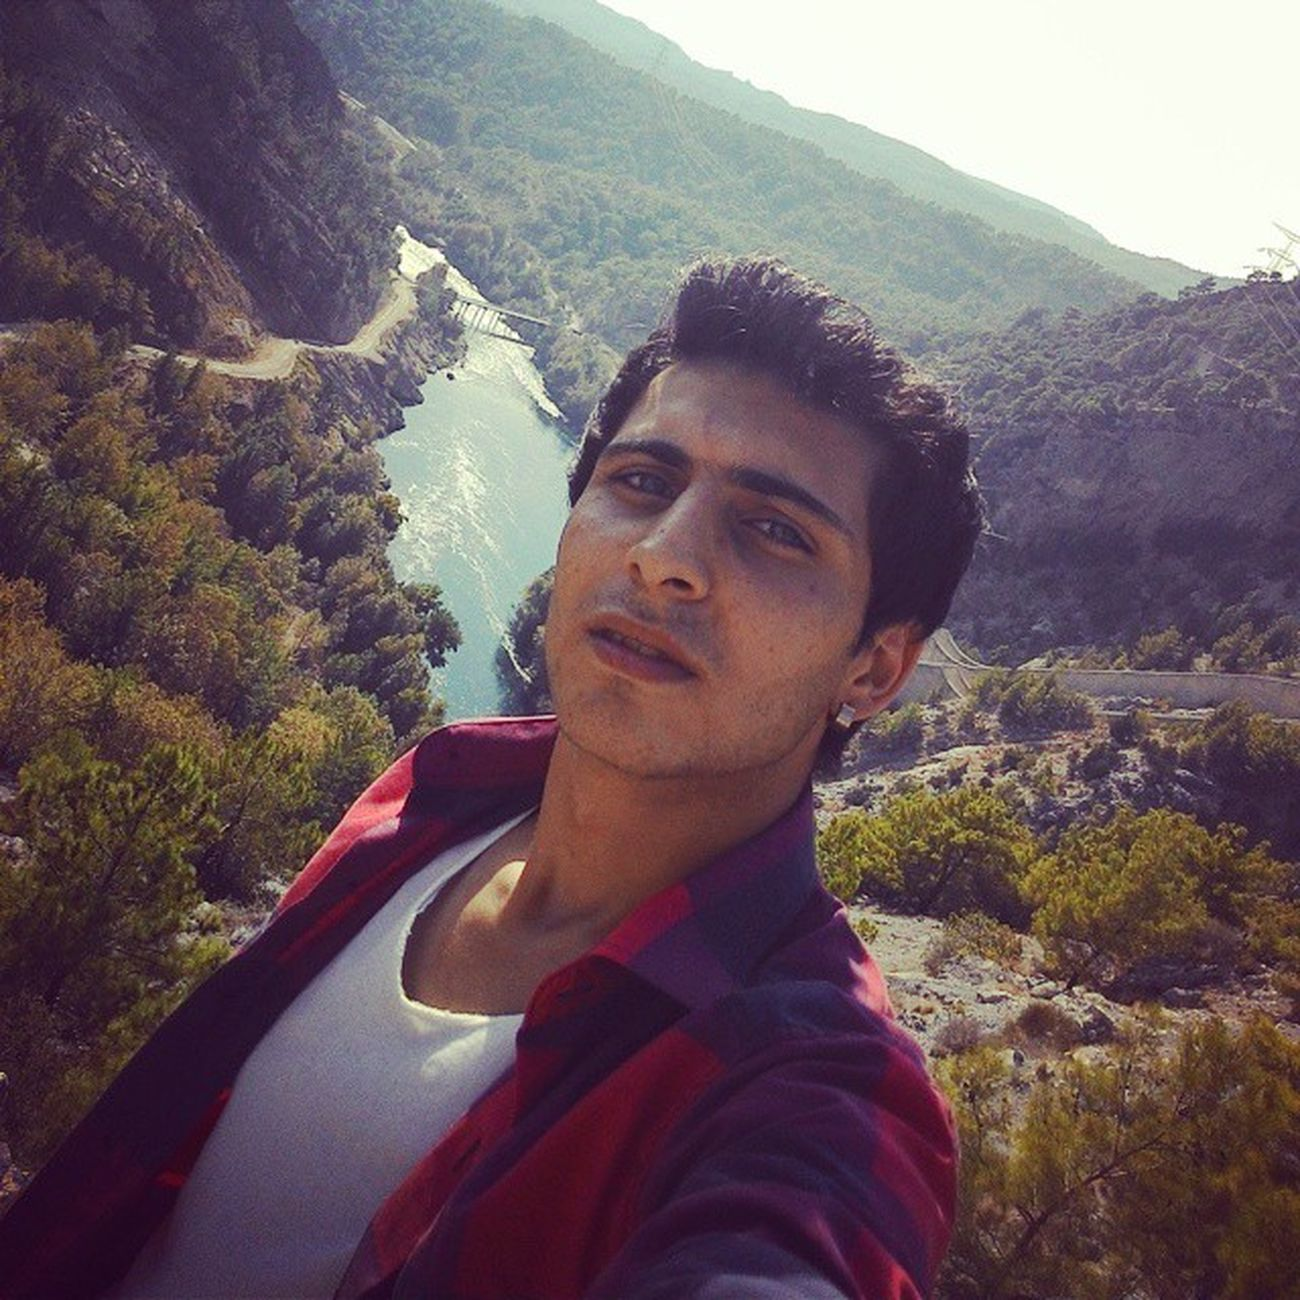 Oymapinar Baraj